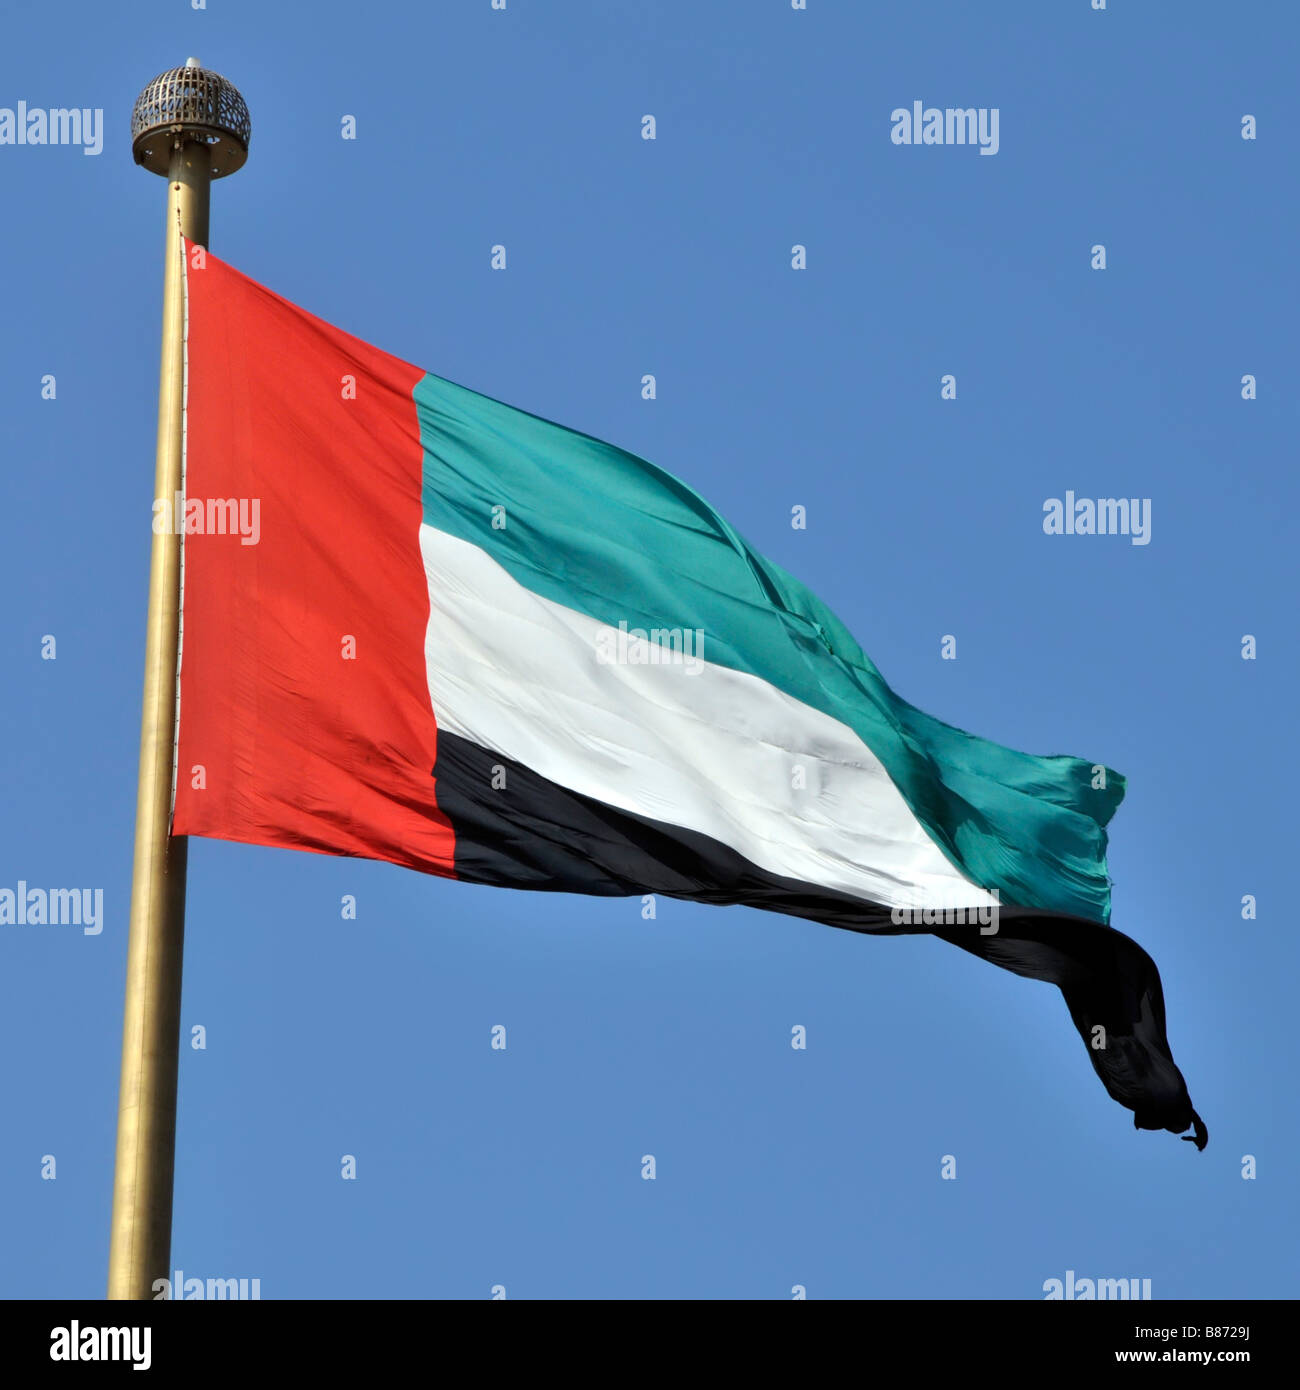 dubai the uae arab emirates flag at jumeirah on the location of stock photo 22283118 alamy. Black Bedroom Furniture Sets. Home Design Ideas